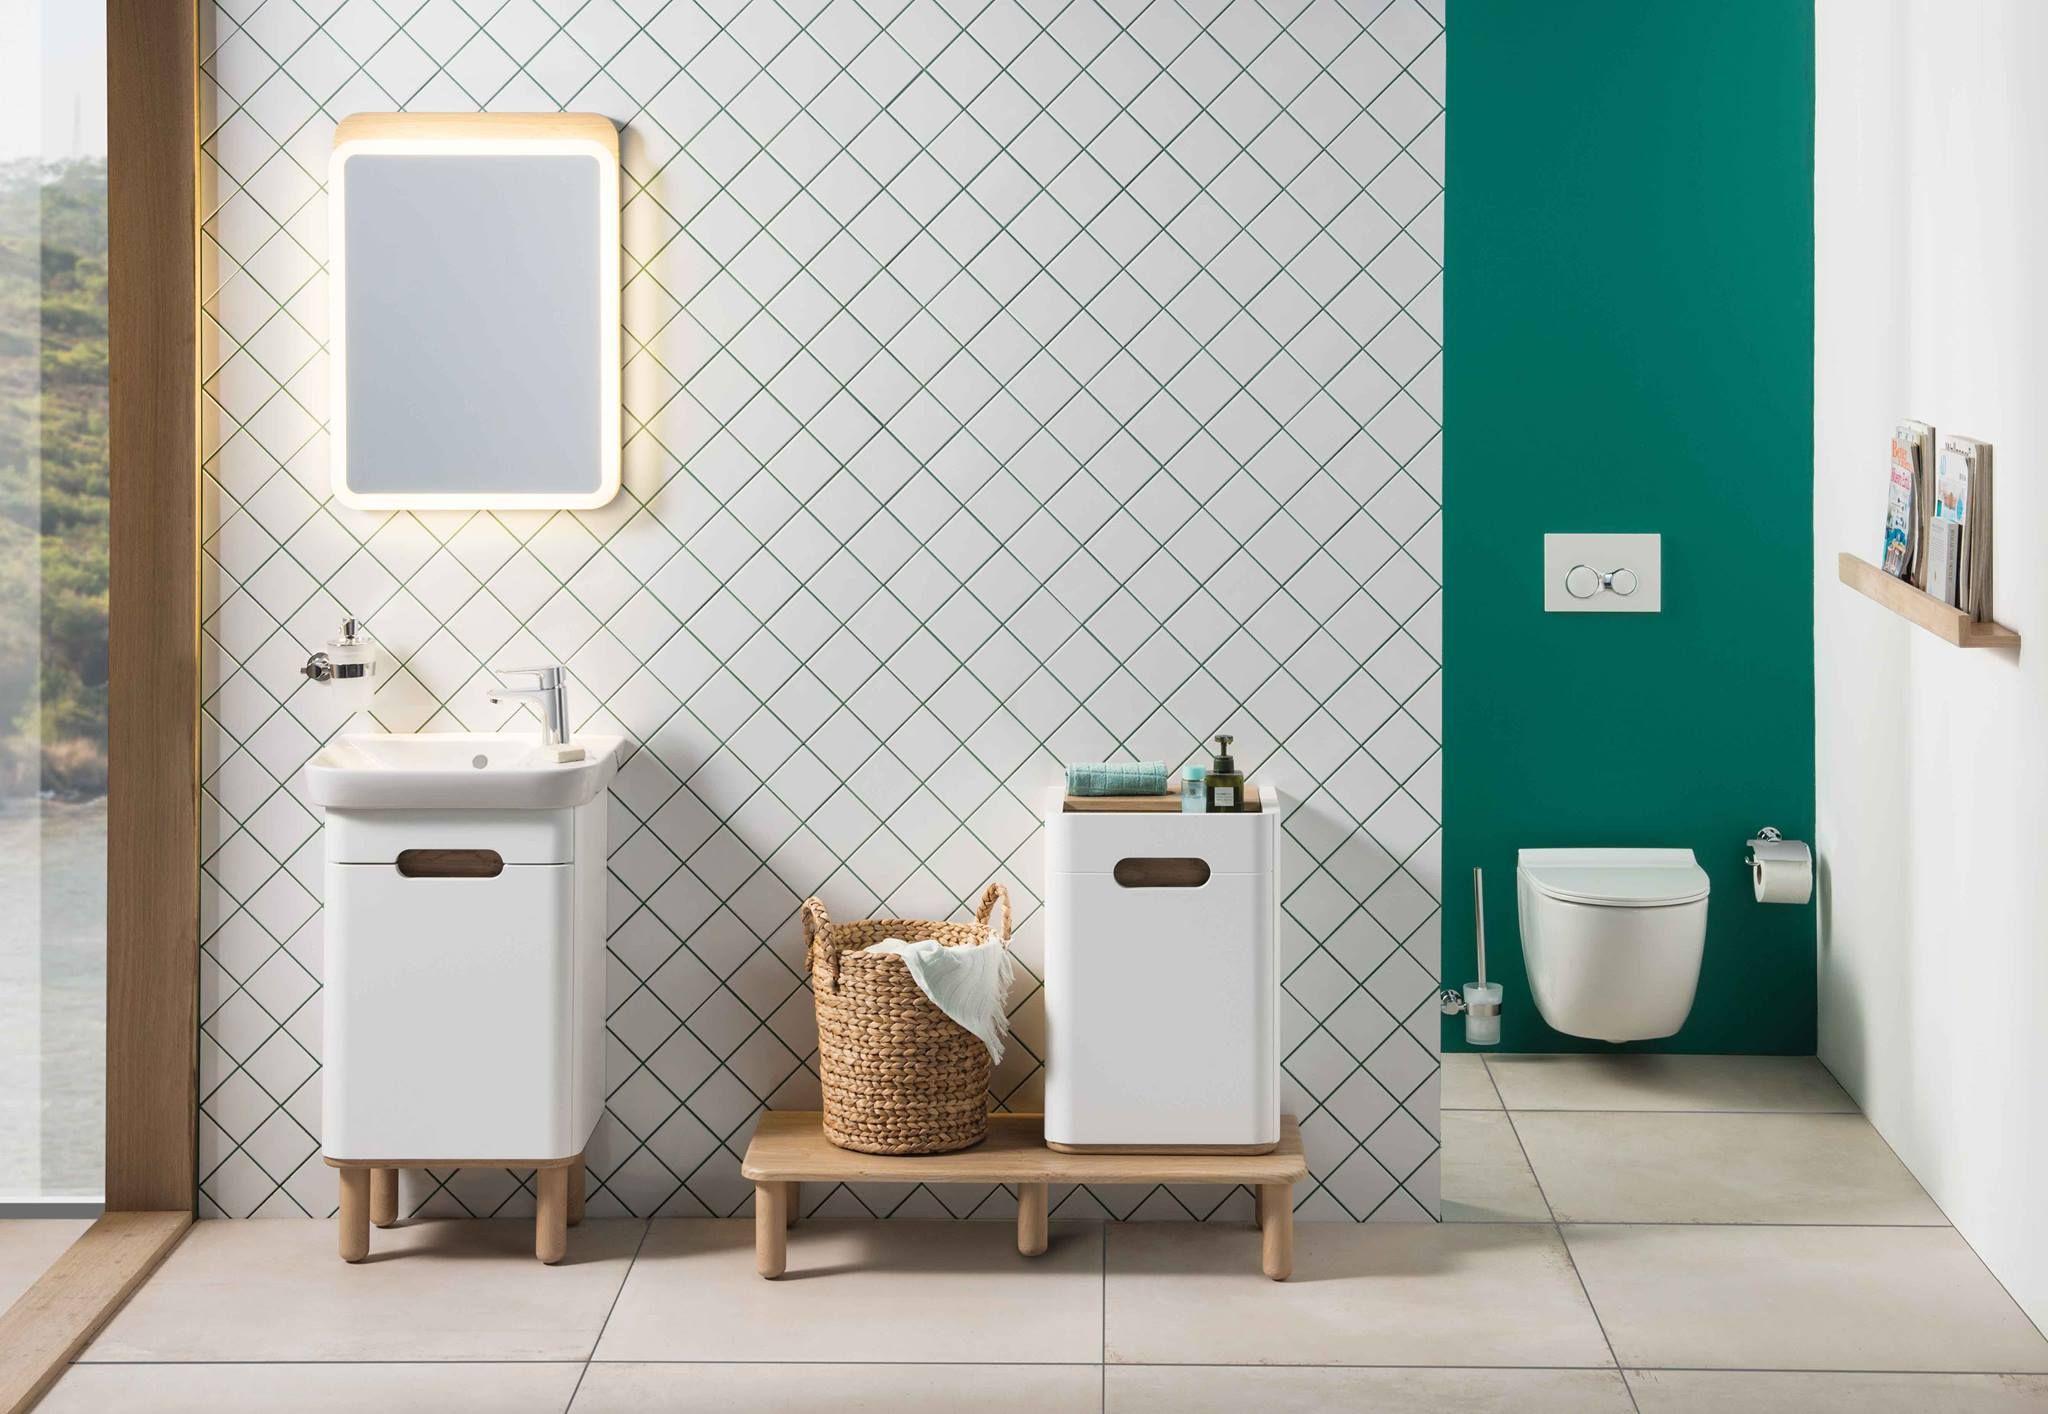 Vitra sento furniture vitra bathrooms pinterest vitra bathrooms vitra sento furniture doublecrazyfo Choice Image